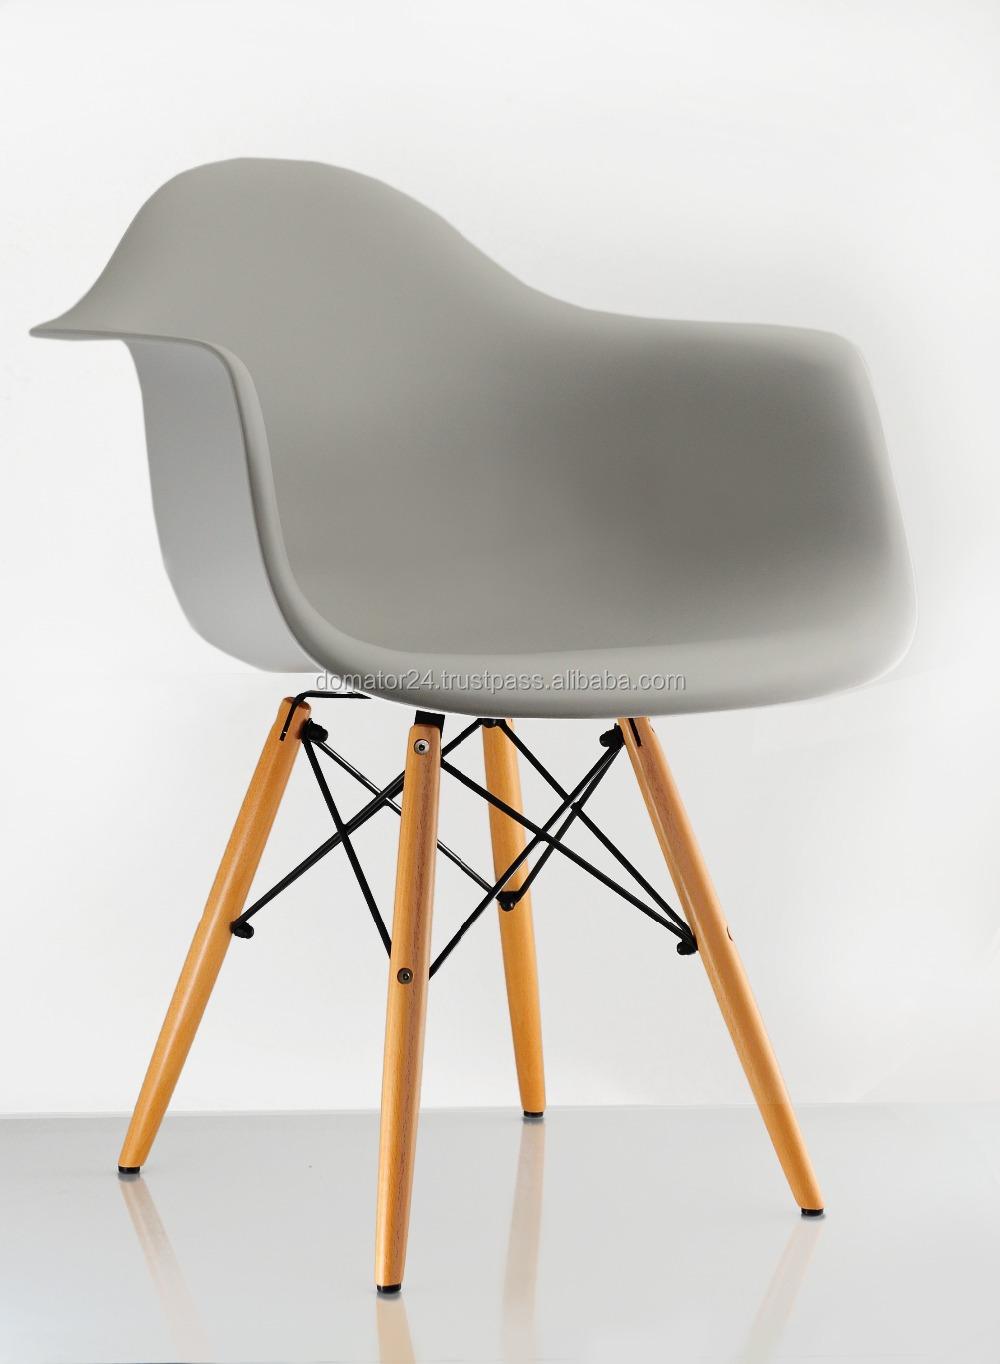 Eiffel Projeto Inspirado Moderna Poltrona Cadeira Para Sala De Estar Sal 227 O De Lazer Top Model 14